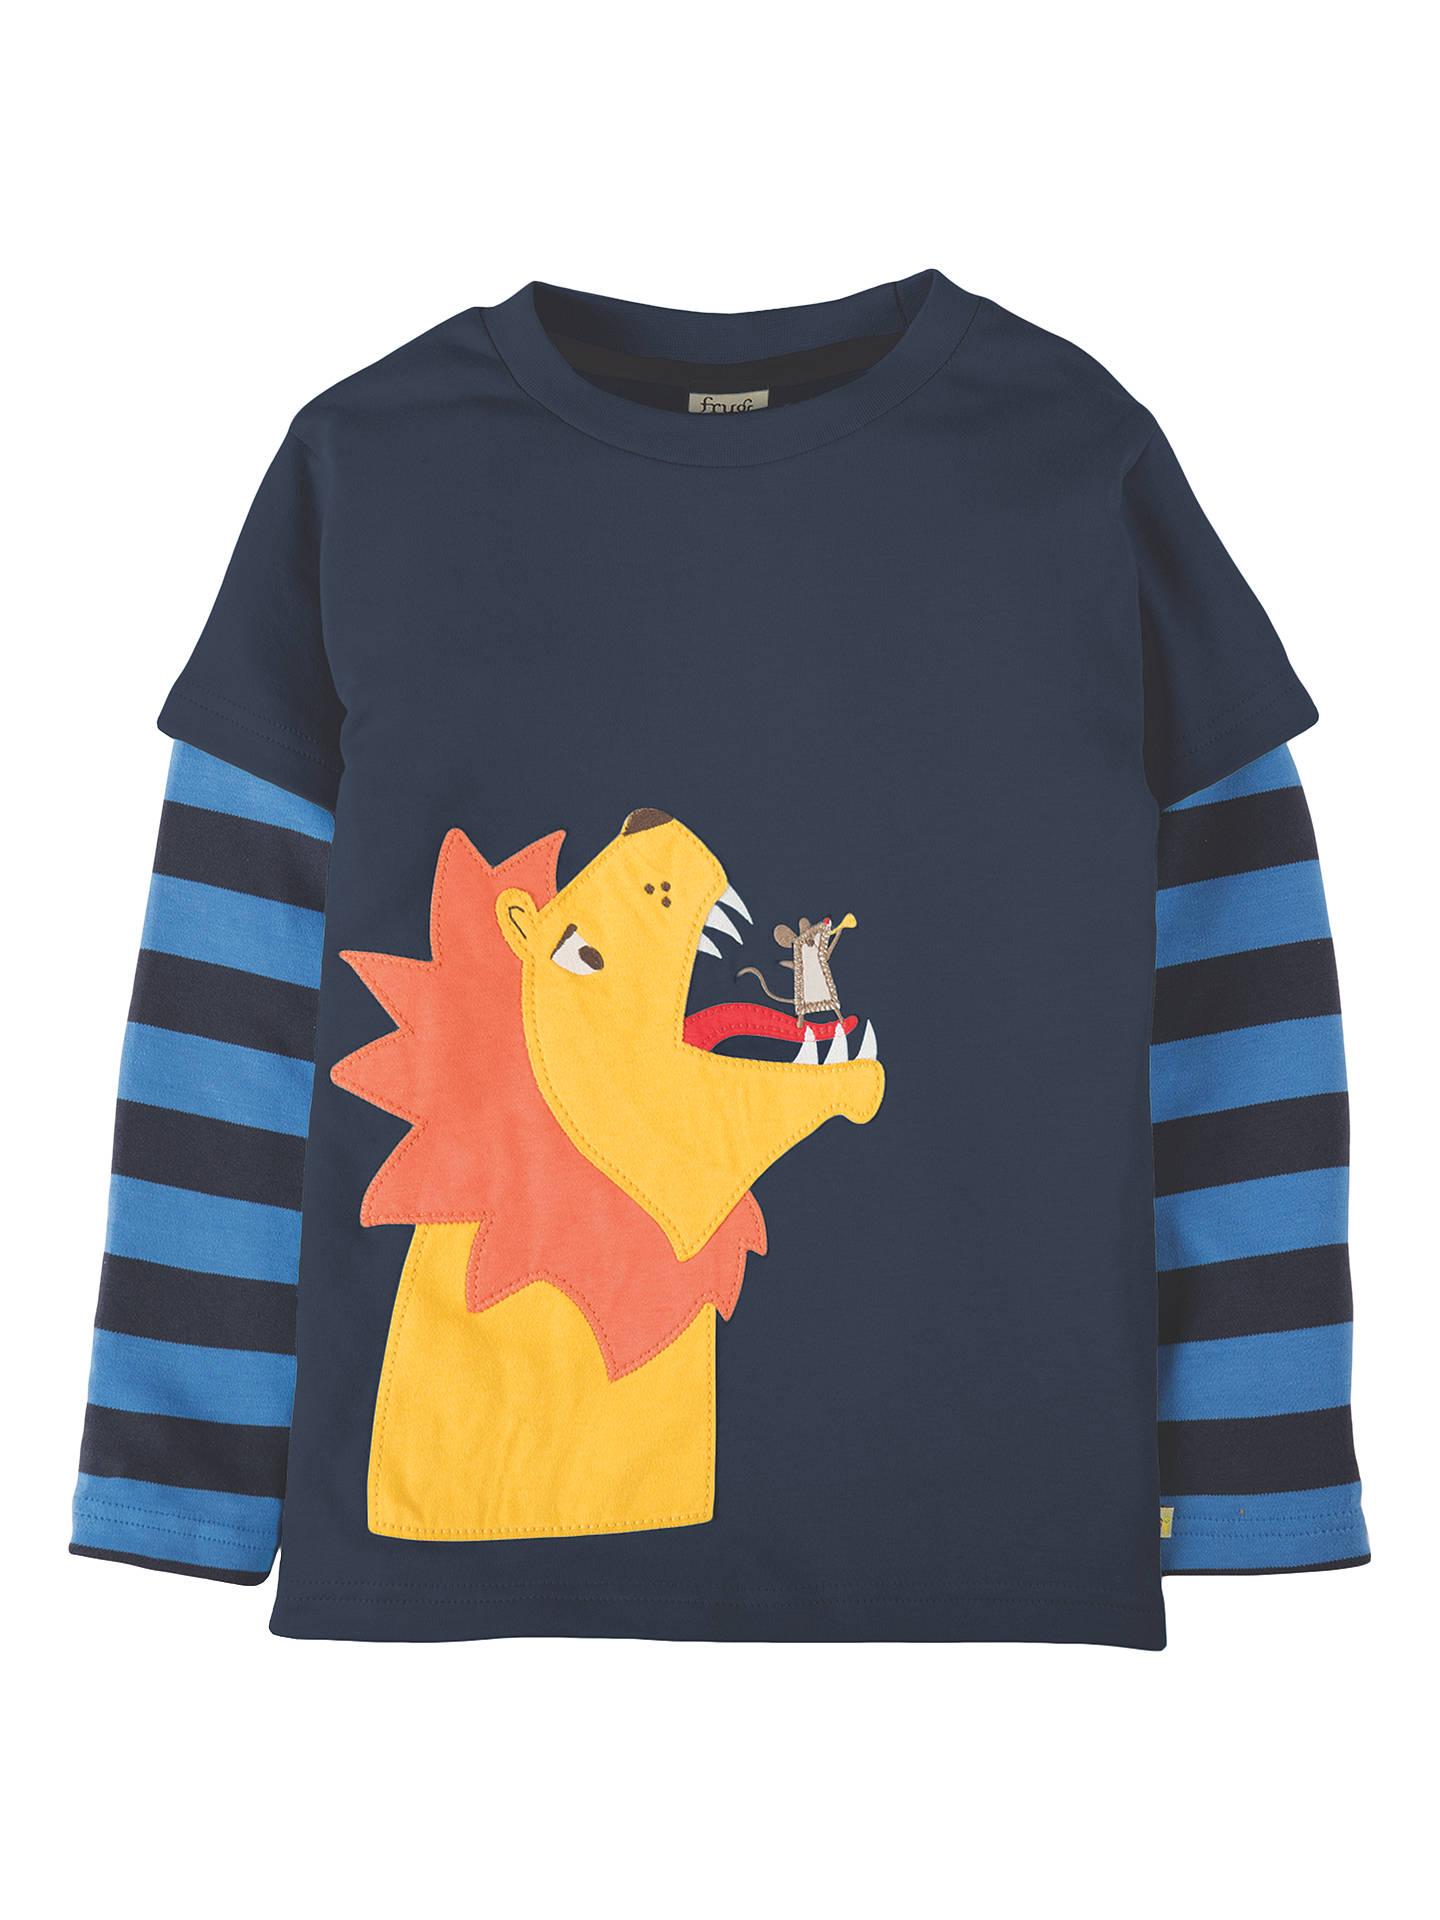 ce6c4798bf Frugi Organic Boys' Lion Applique Long Sleeve T-Shirt, Navy at John ...